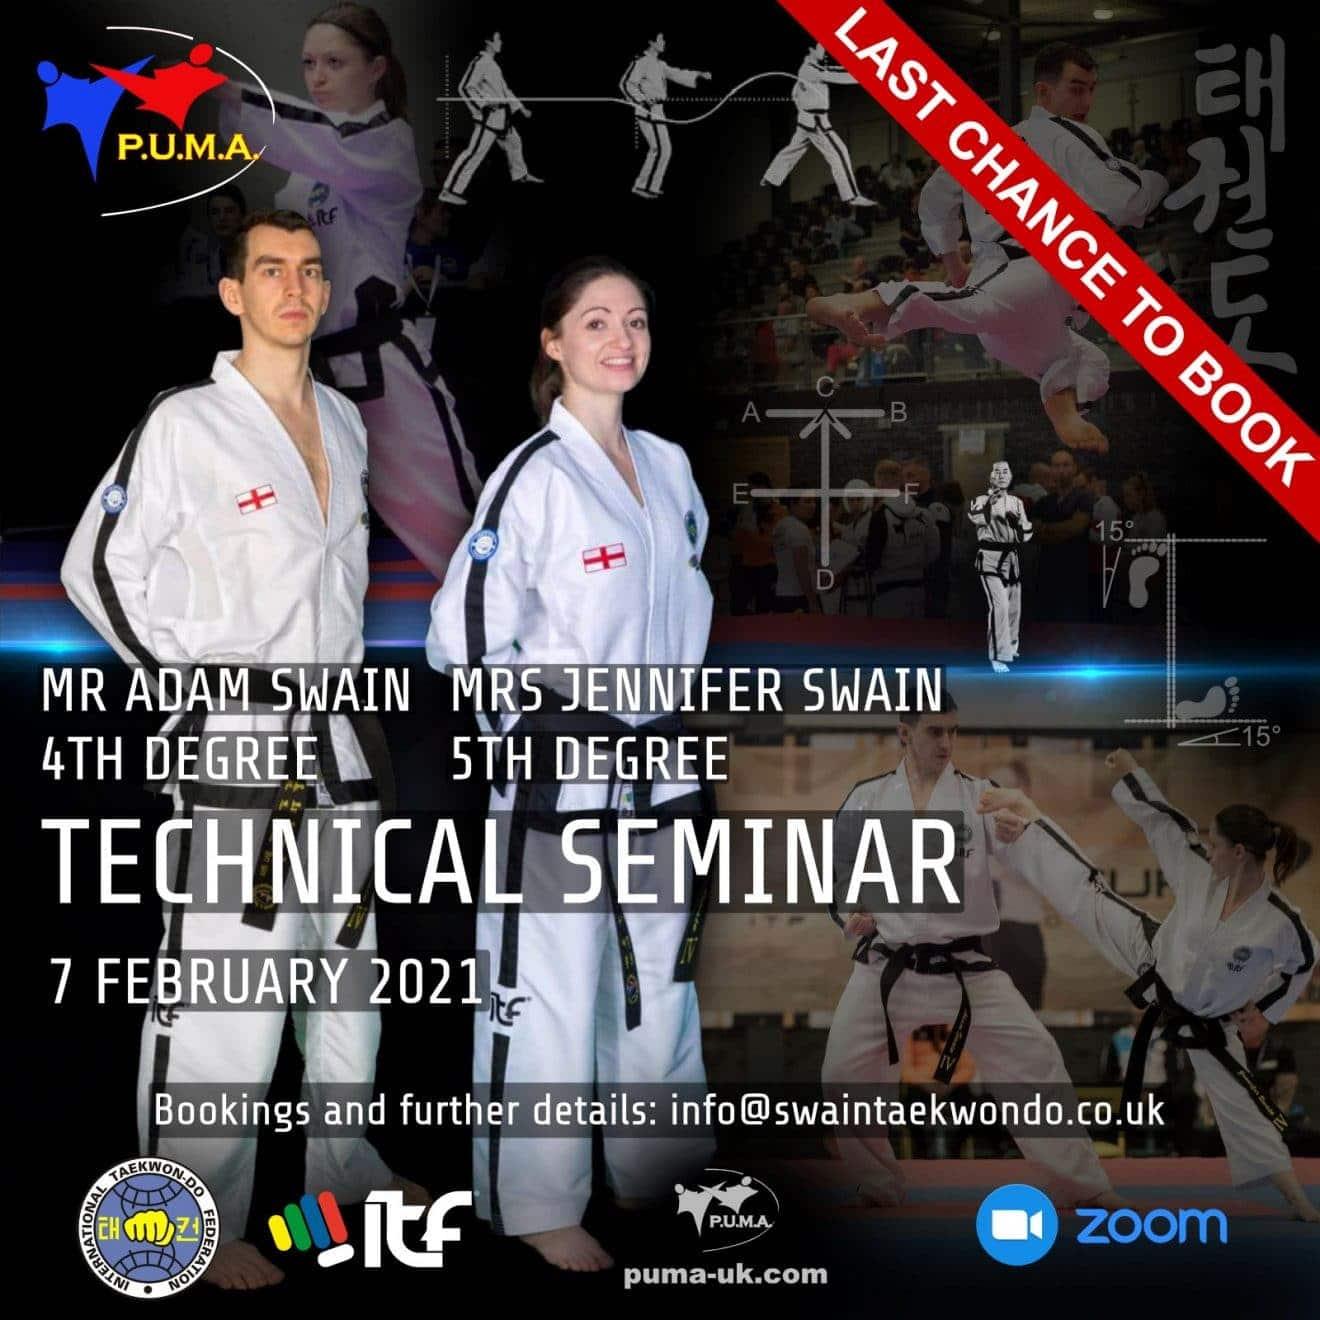 PUMA Technical Seminar Reminder poster